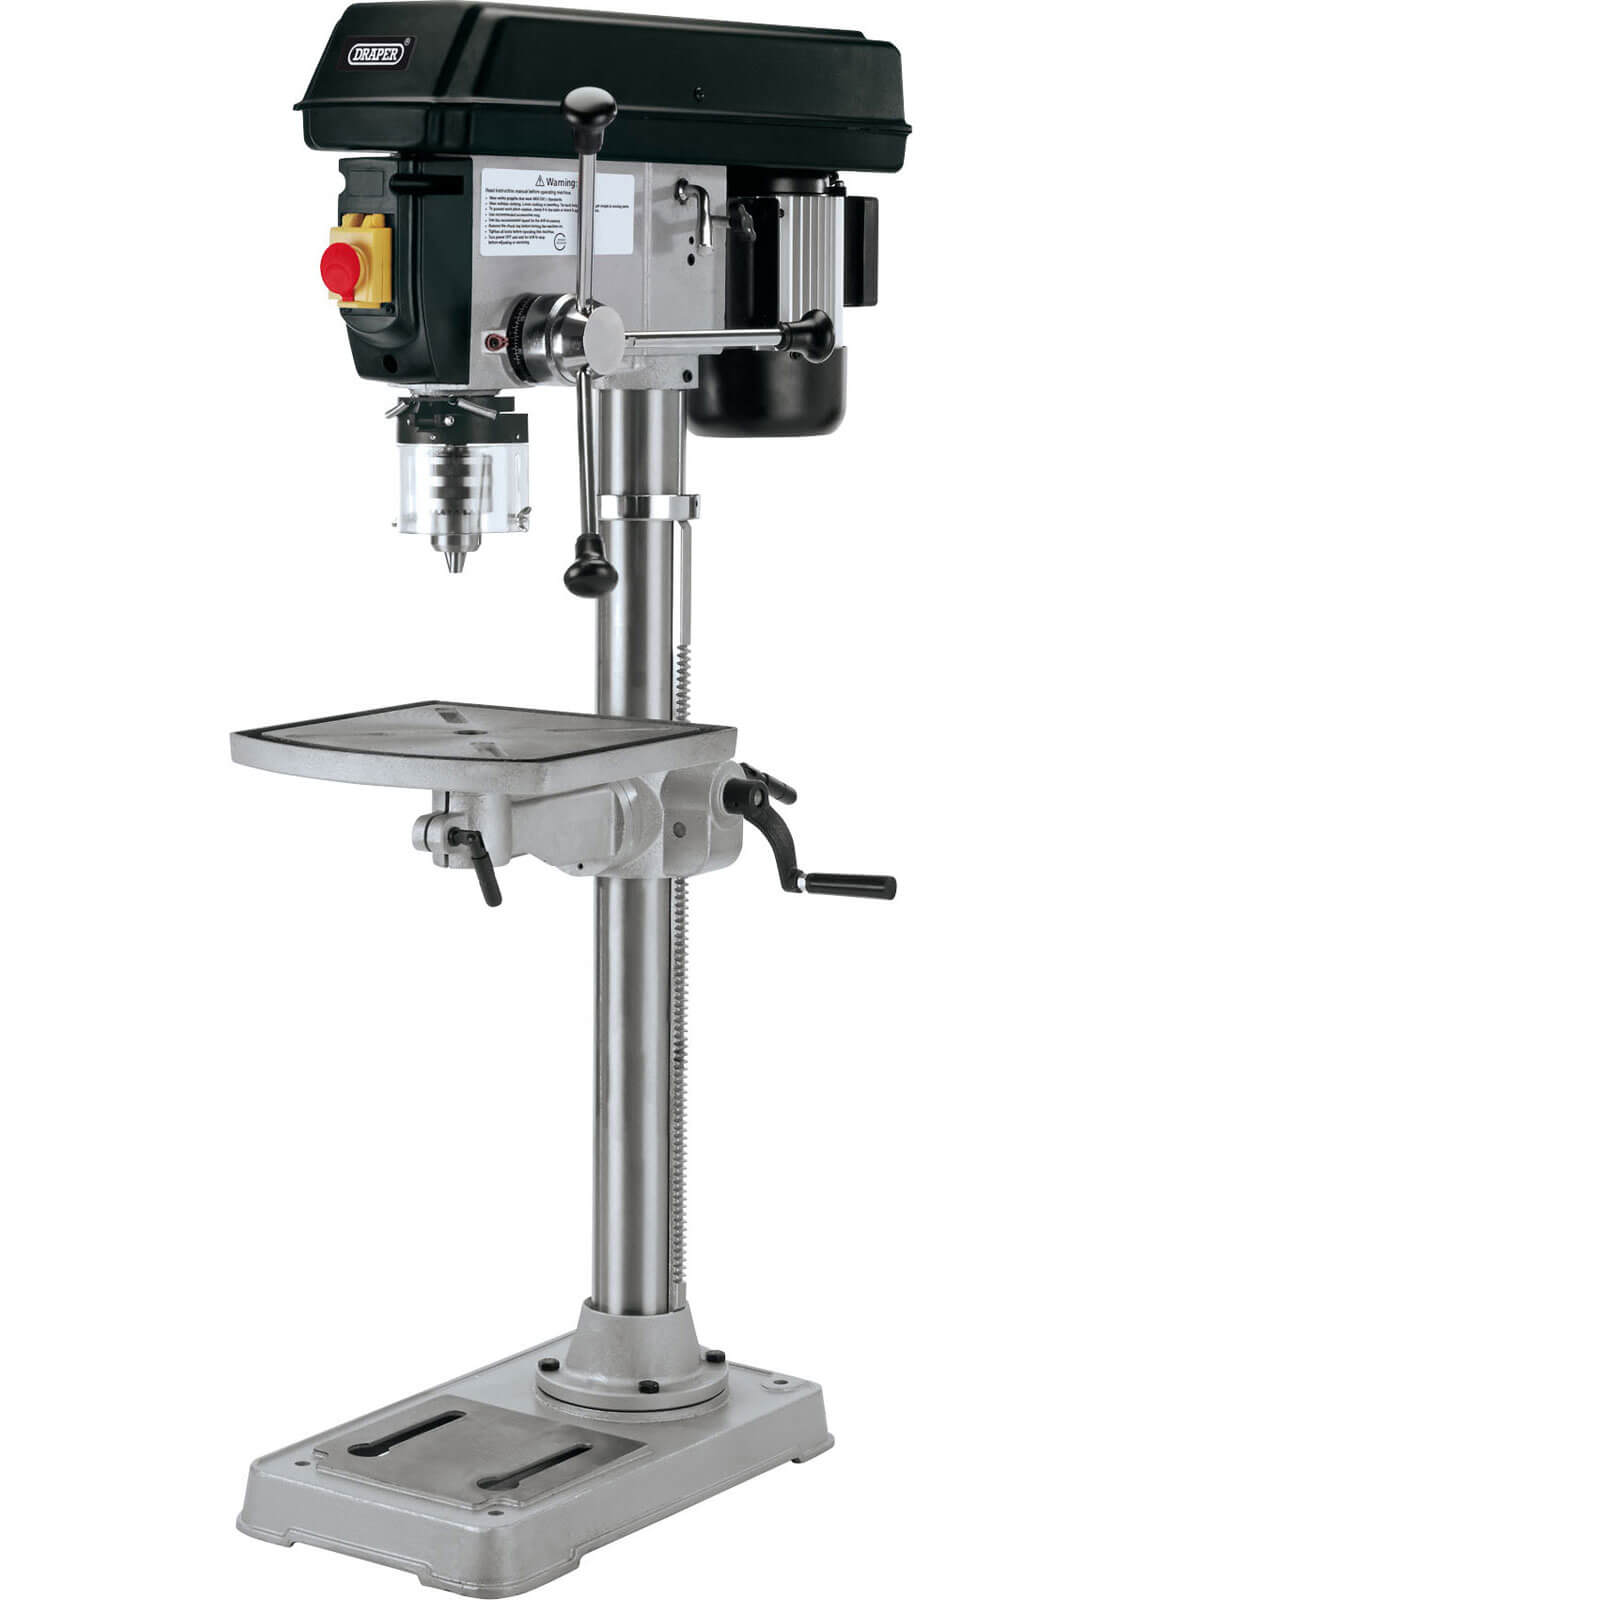 Draper GD20/12E 12 Speed Bench Drill 240v